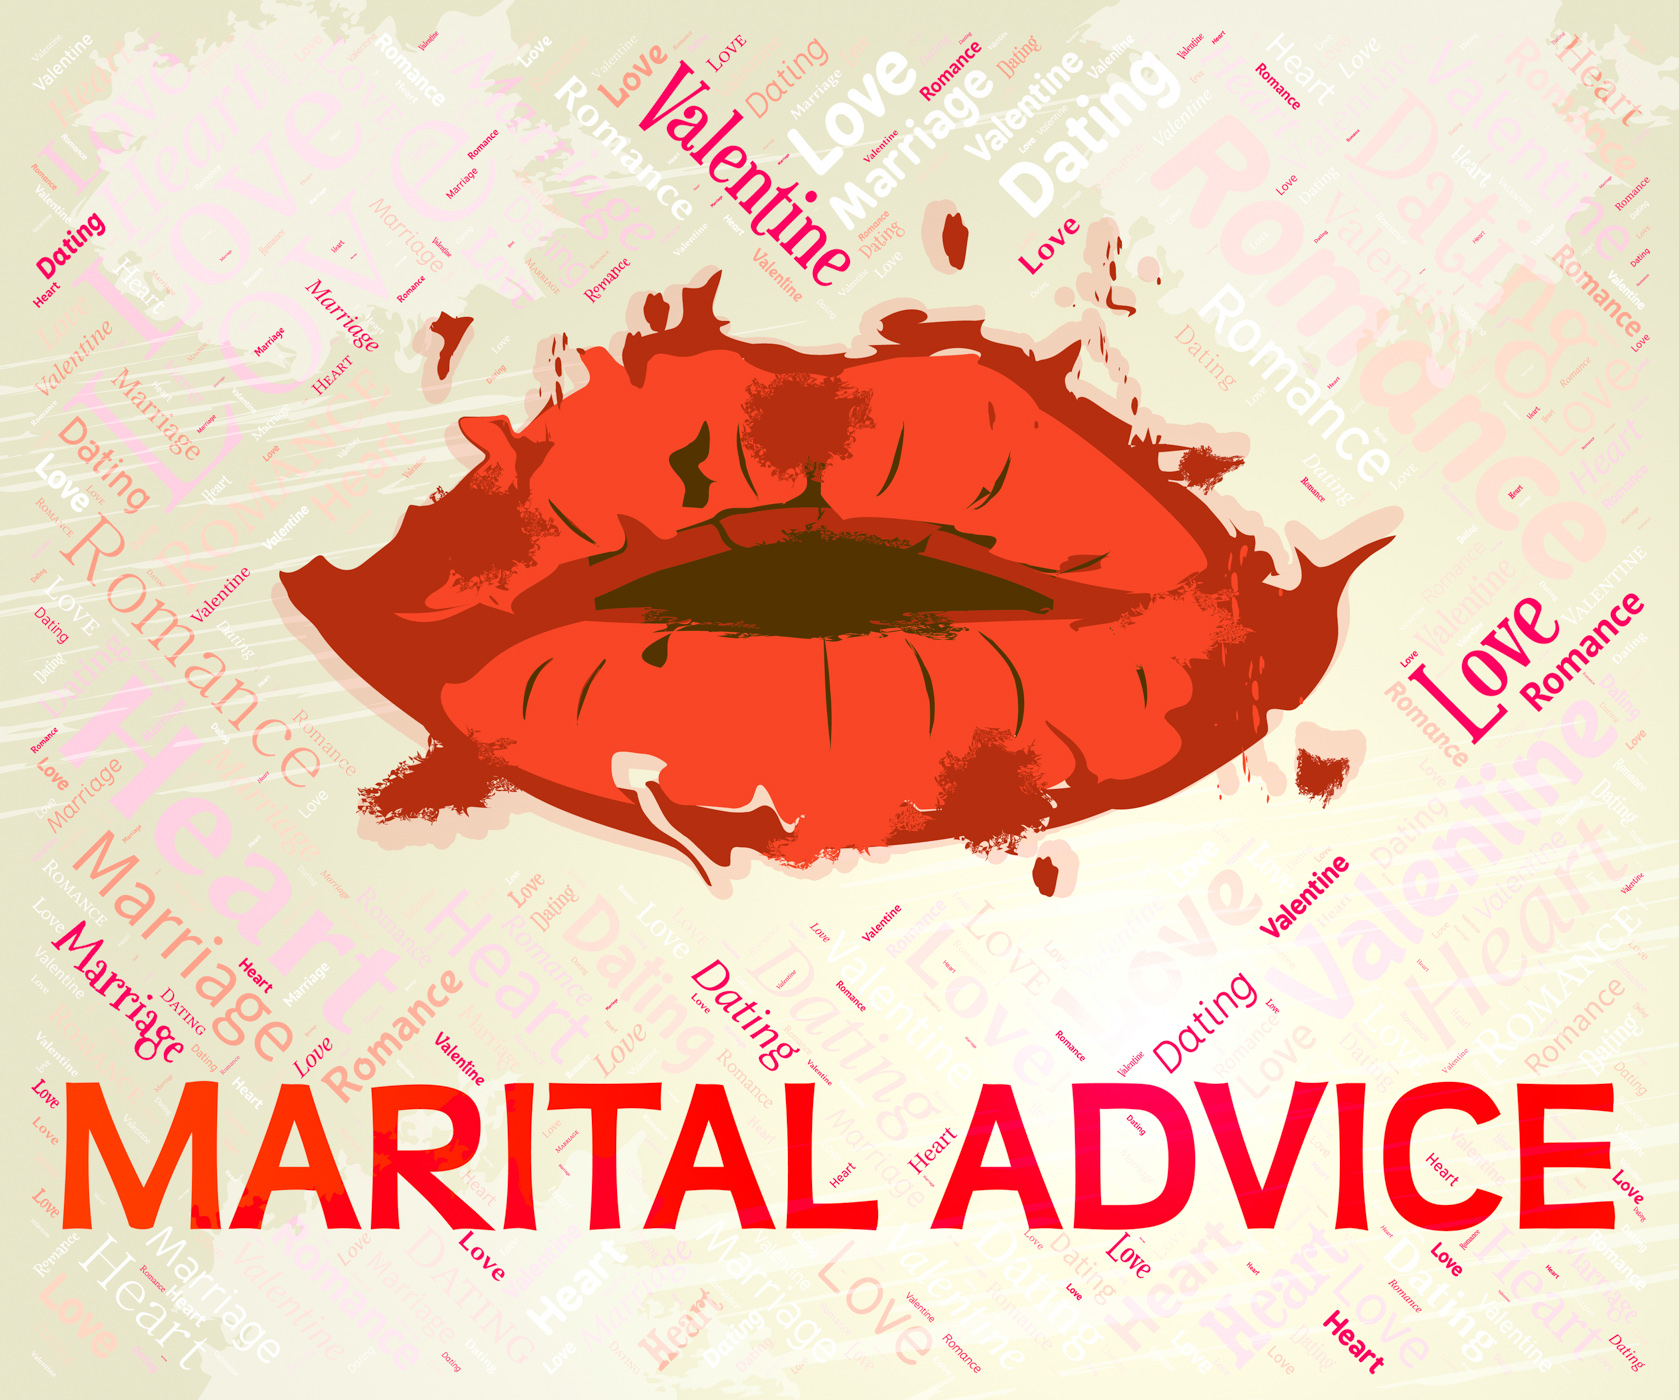 Marital advice means faq info and couple photo